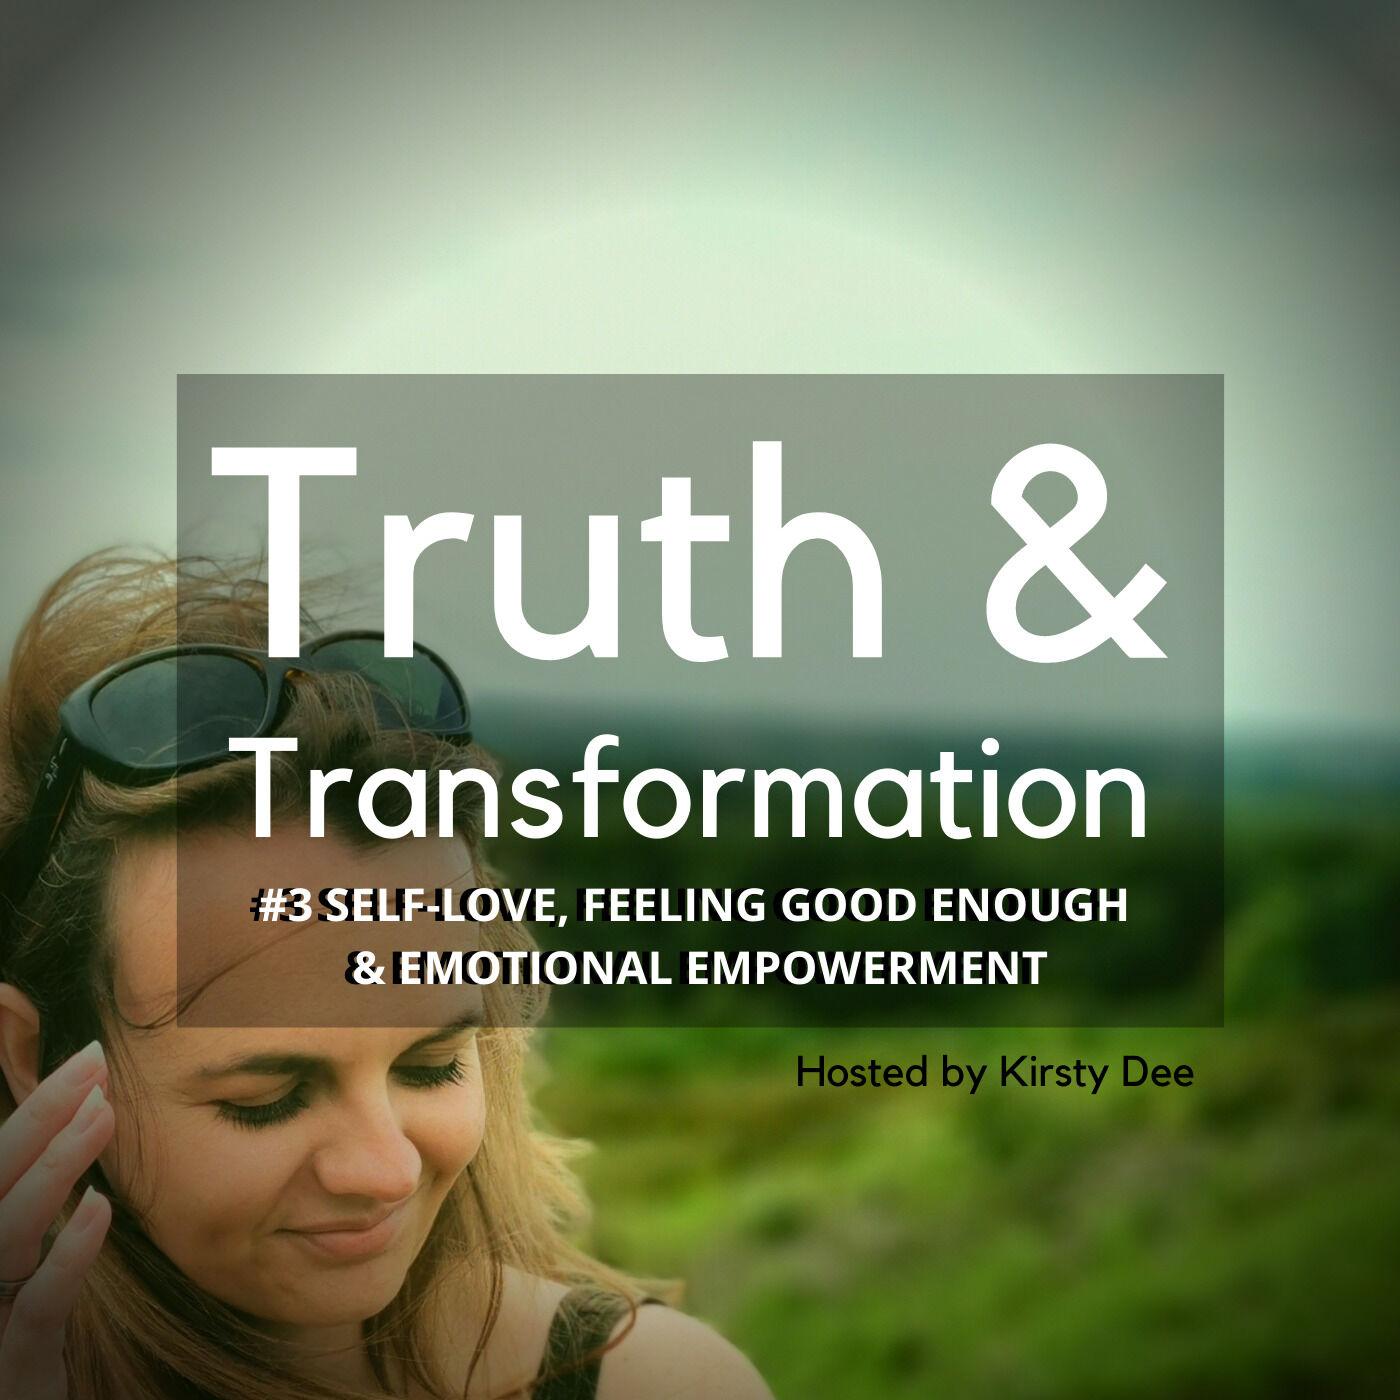 #3 SELF-LOVE, FEELING GOOD ENOUGH & EMOTIONAL EMPOWERMENT